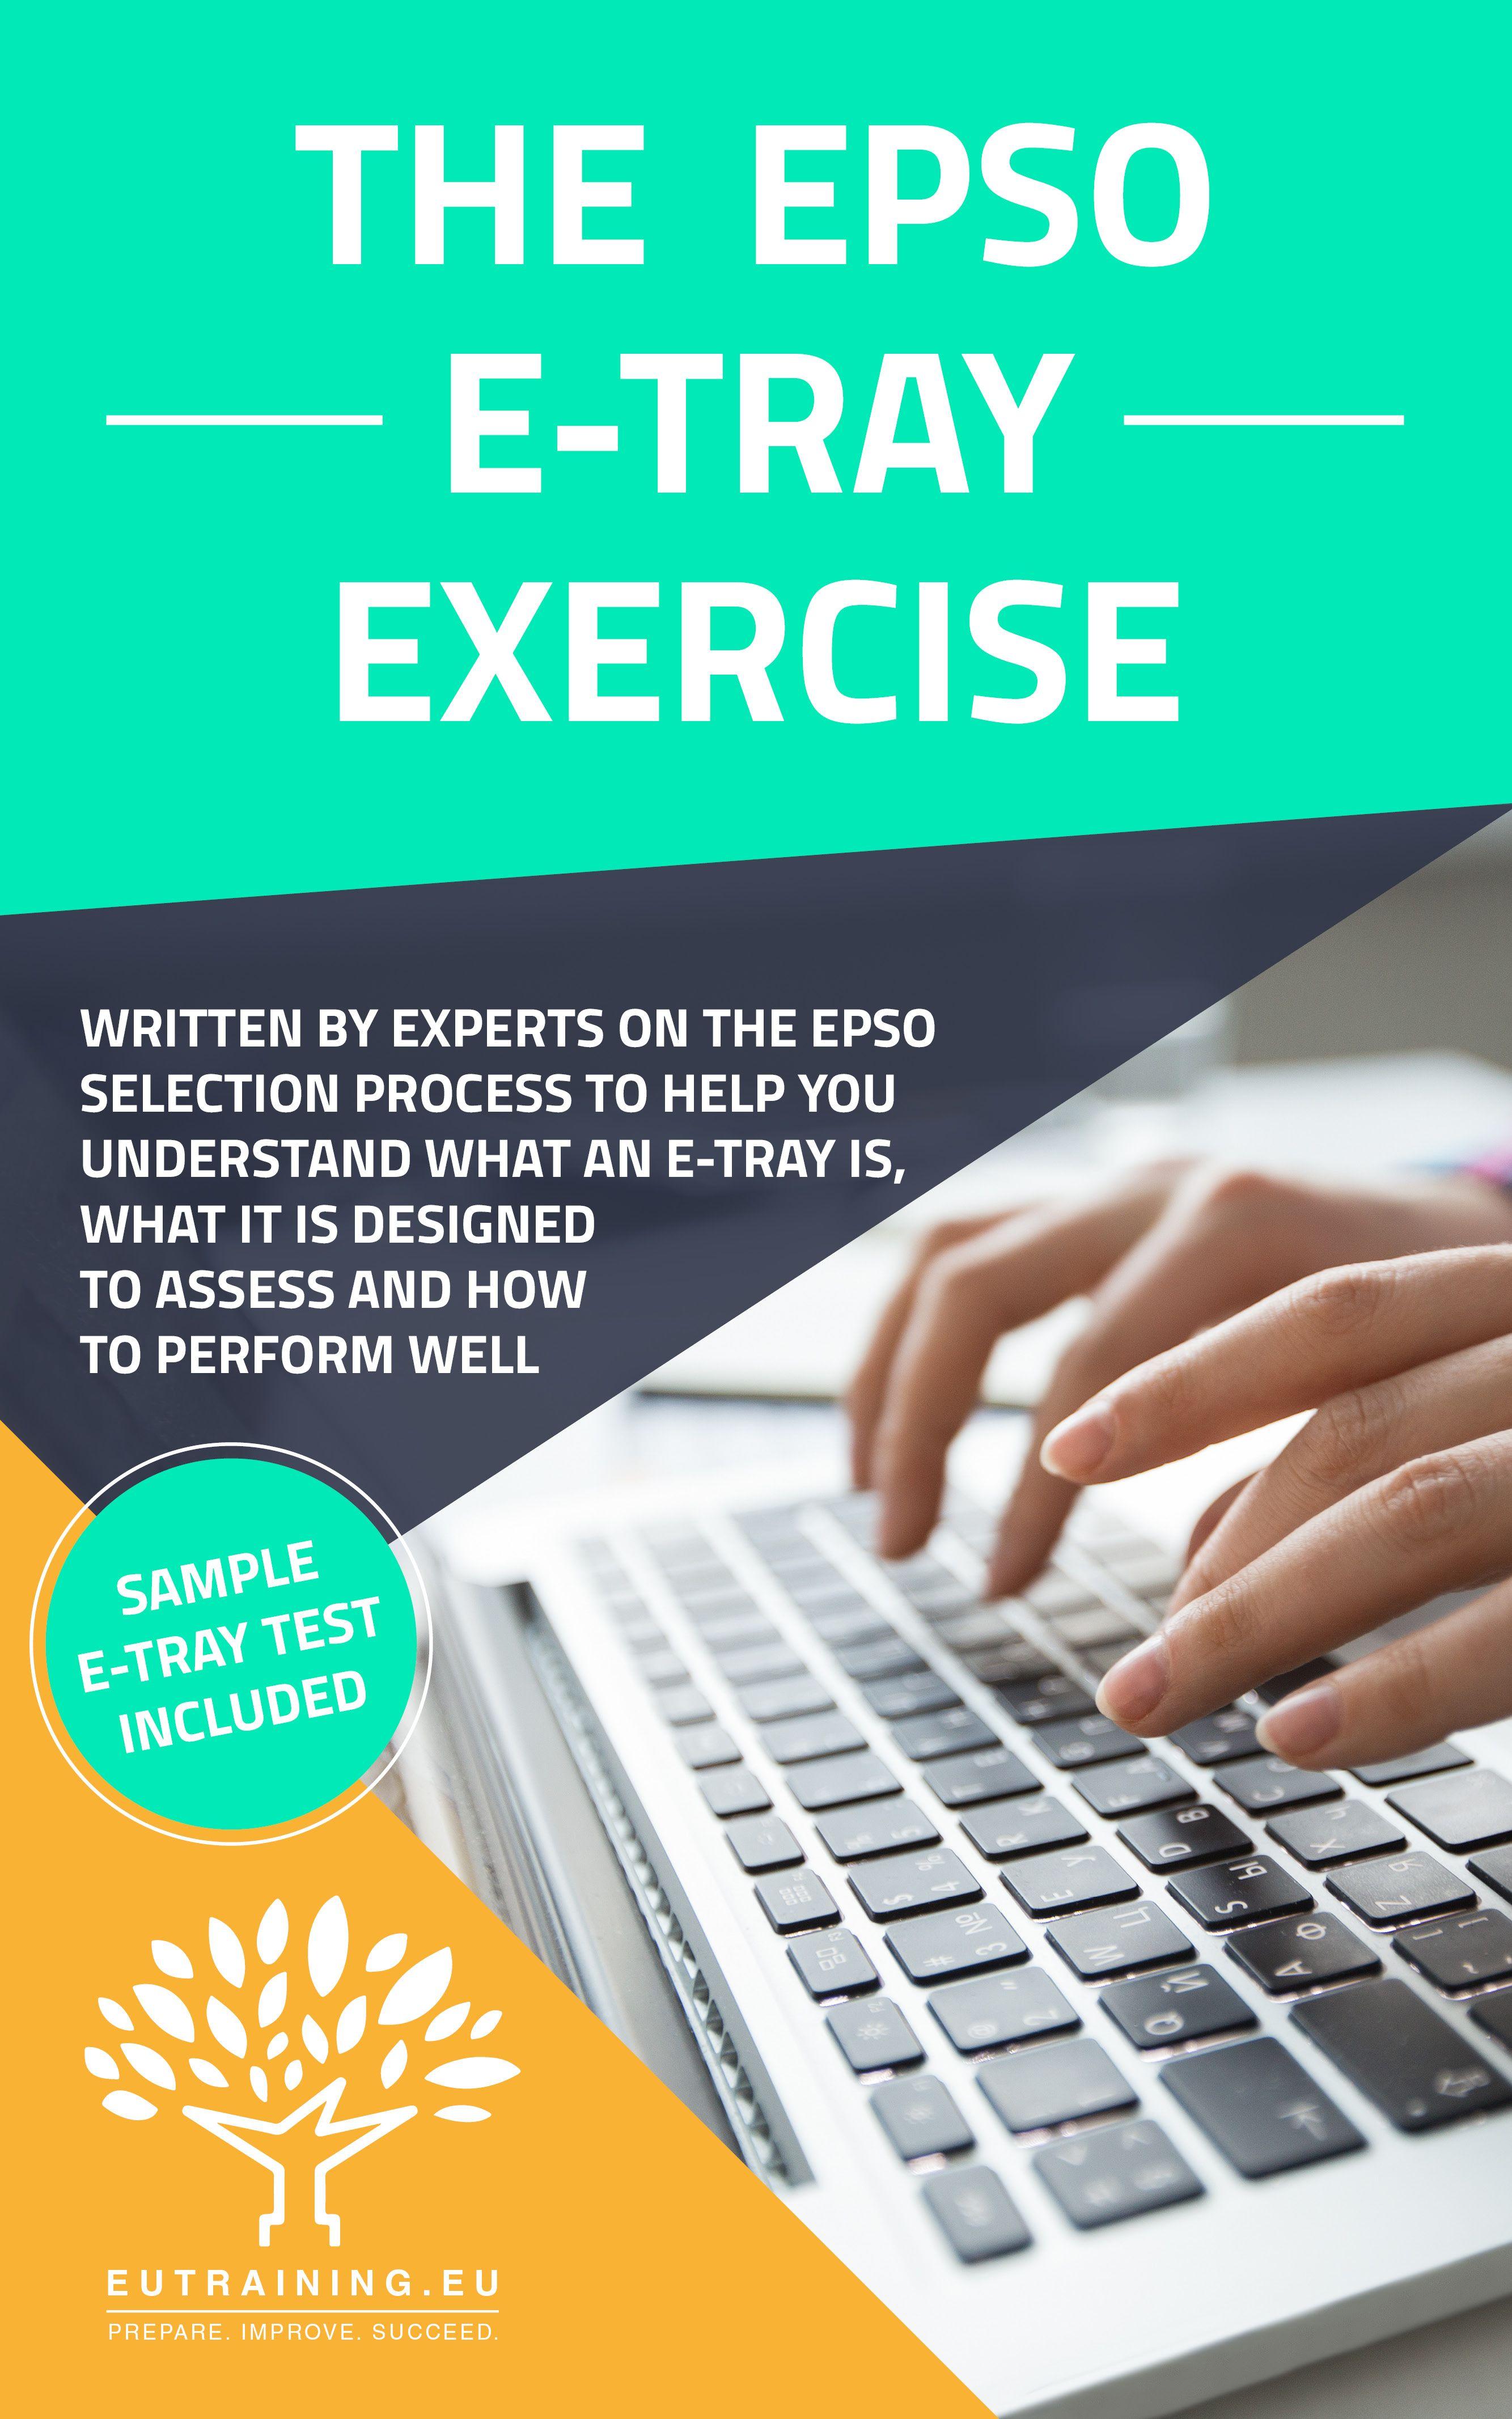 Eu Training: EPSO Etray Ebook for Amazon Kindle